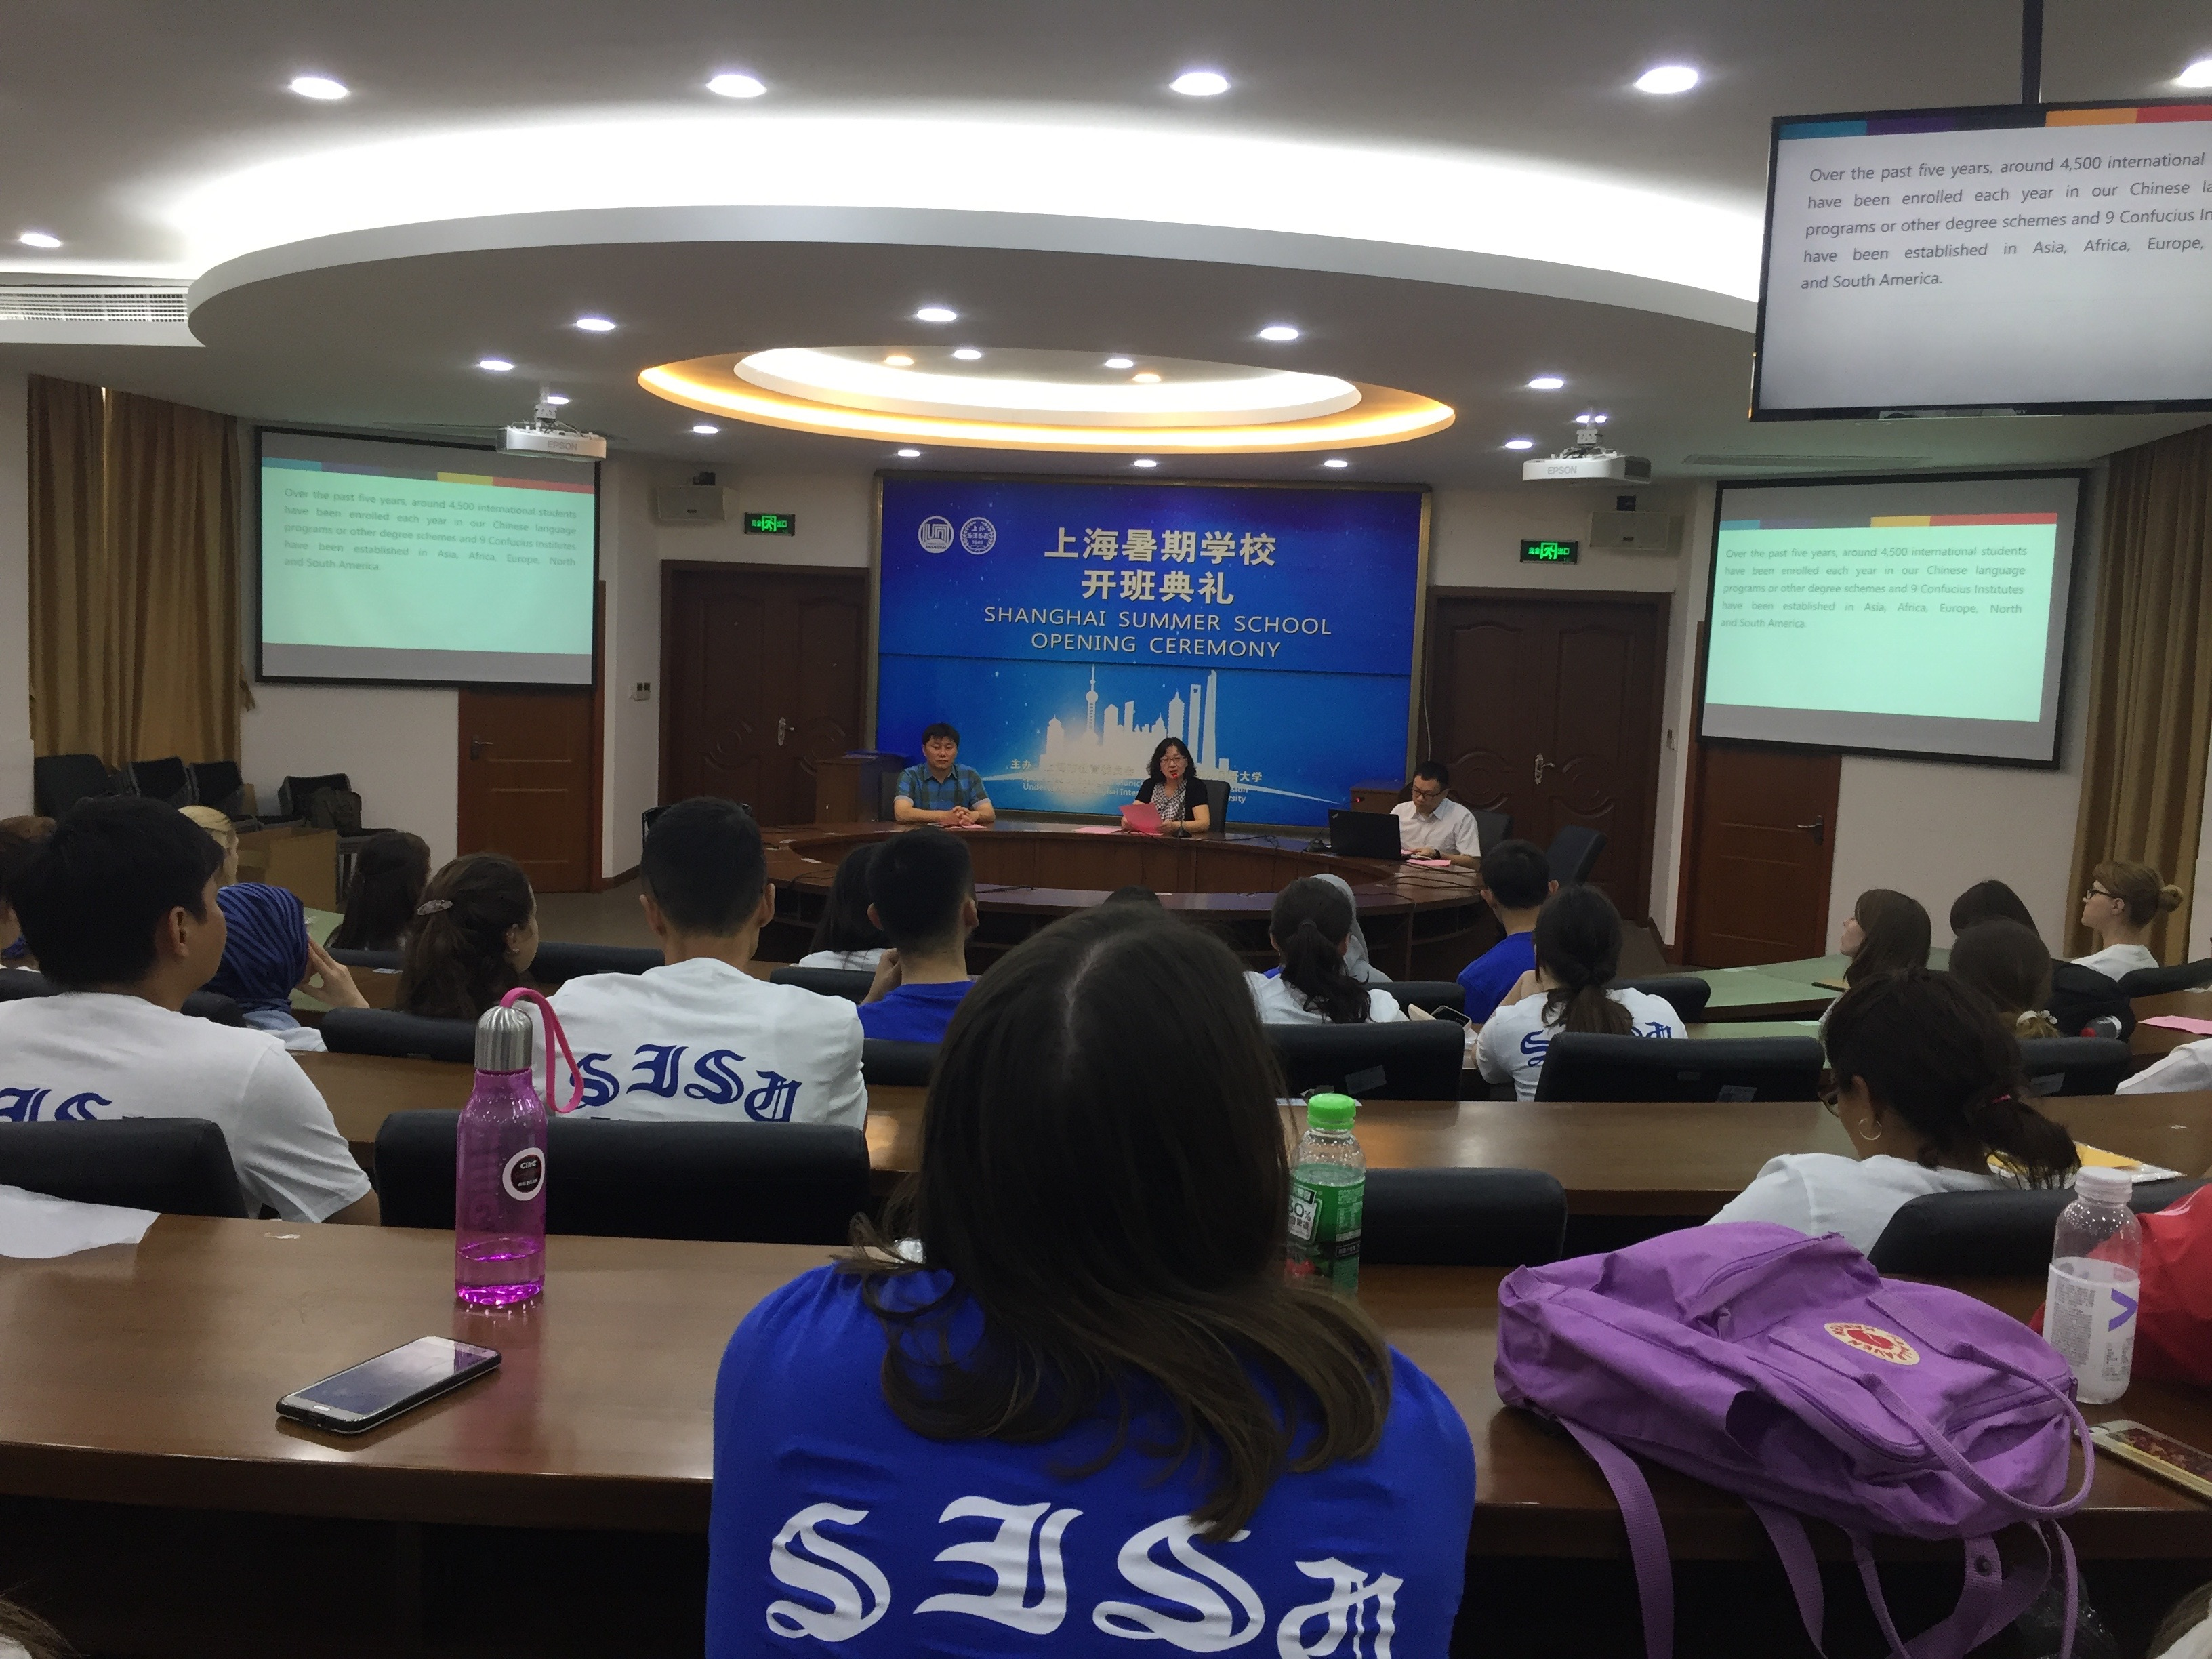 Shanghai Summer School scholarship at SISU University – Zutoia Ríos